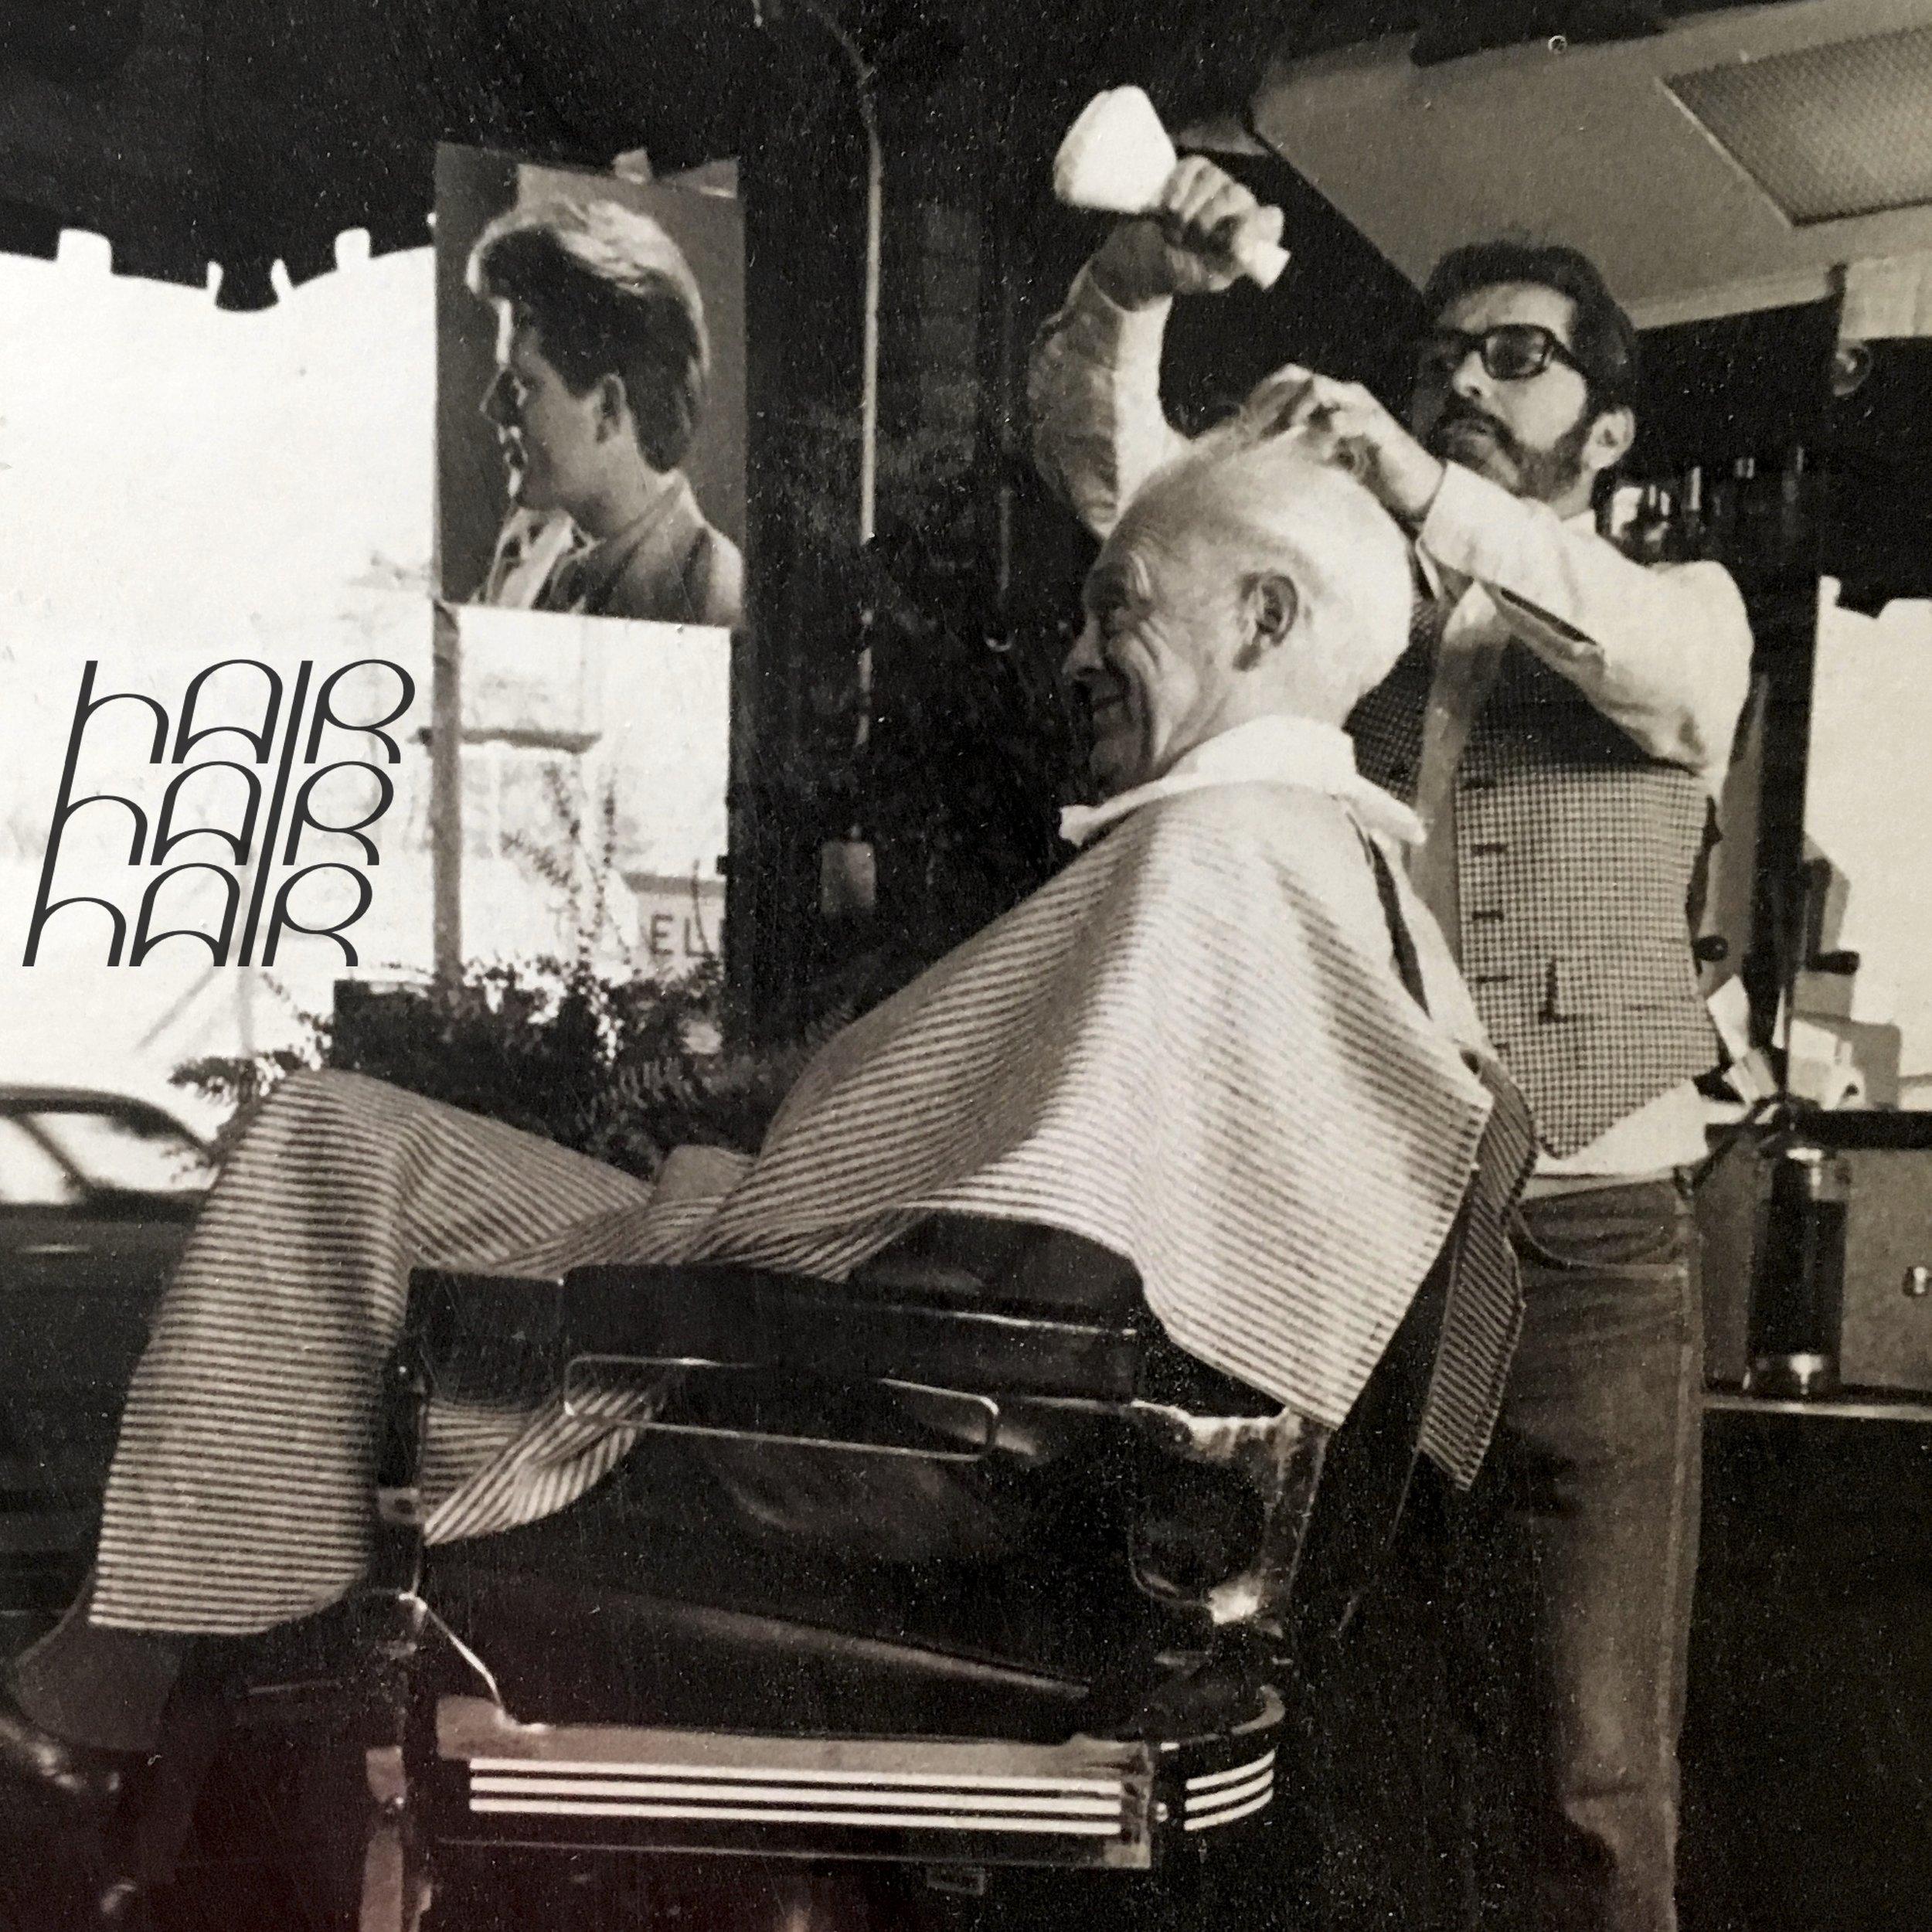 hairhairhair-walt.jpg